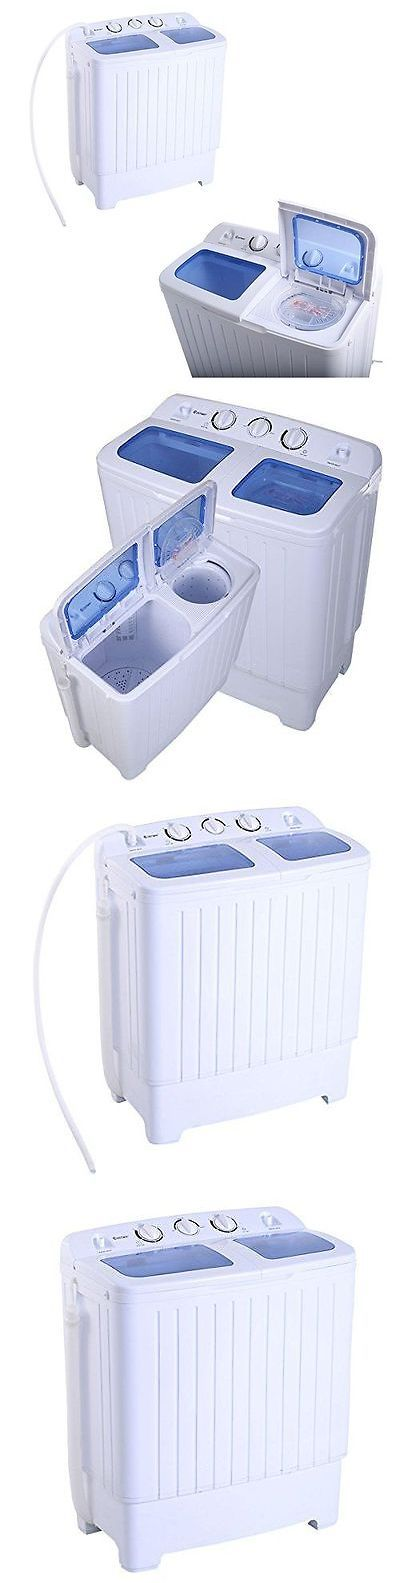 best 25 small washing machine ideas on pinterest